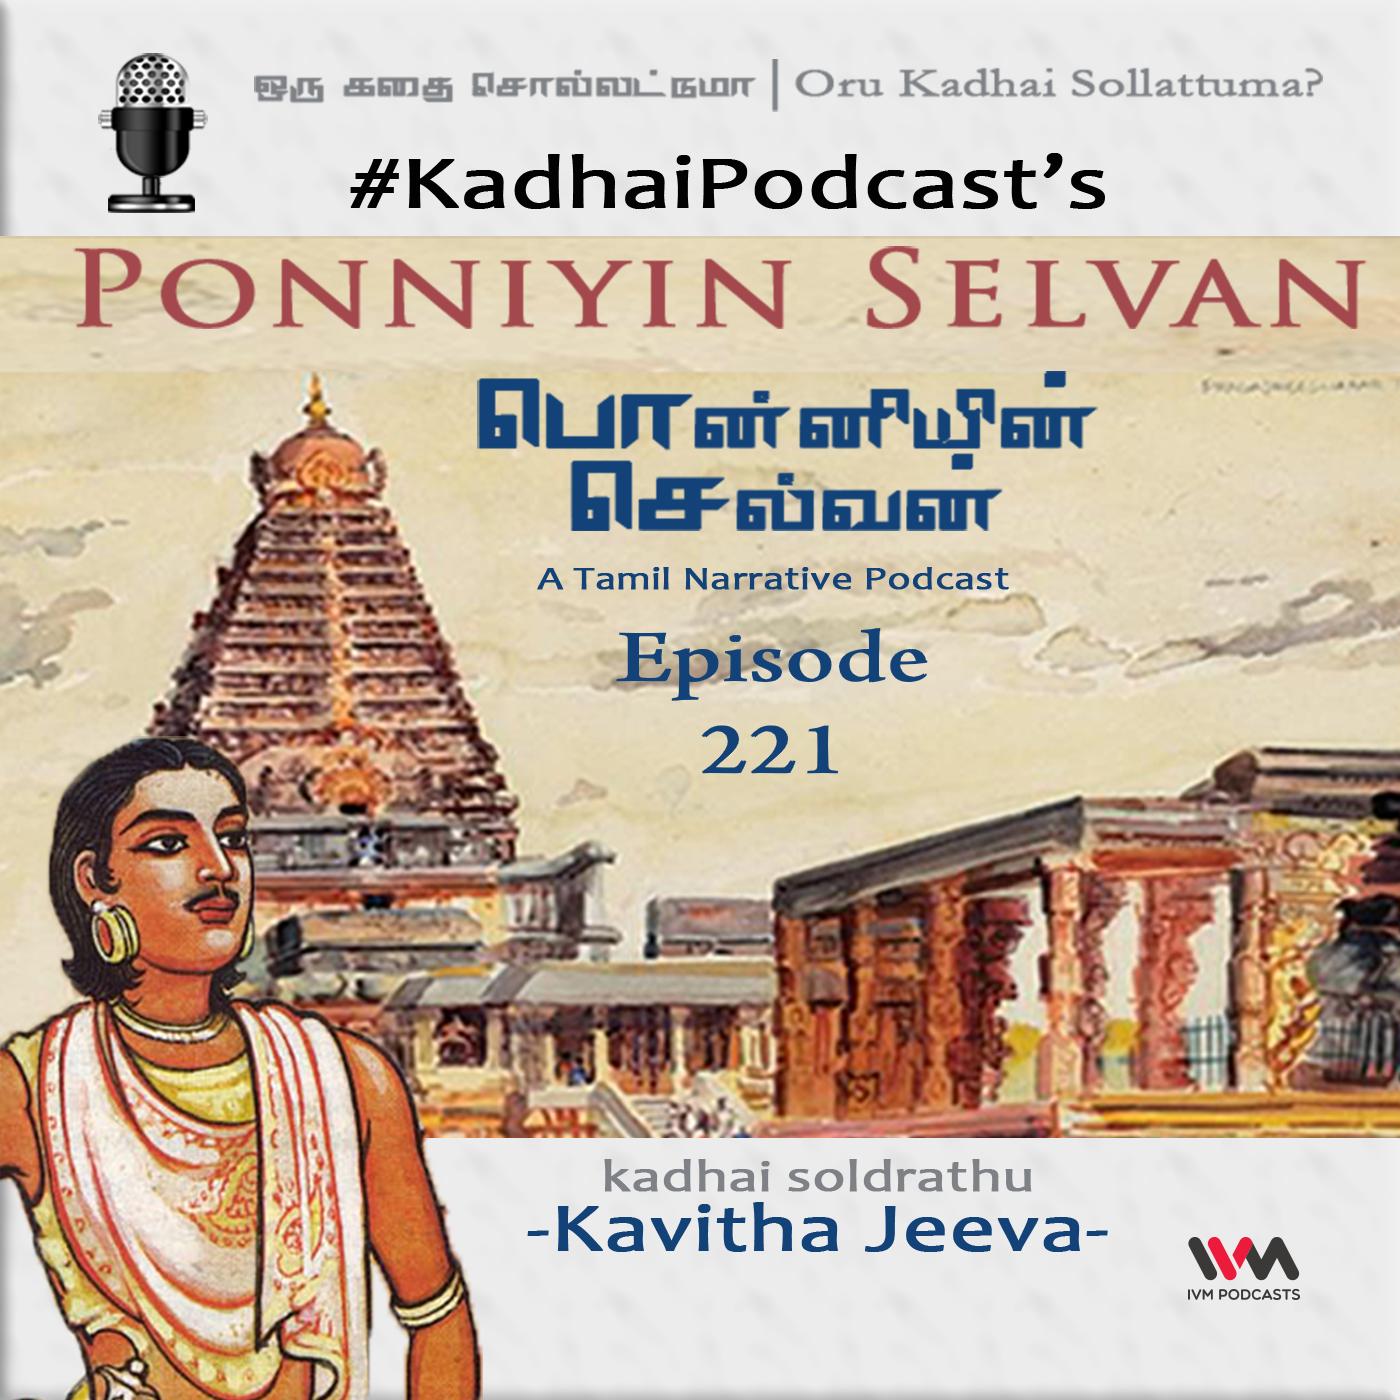 KadhaiPodcast's Ponniyin Selvan - Episode # 221